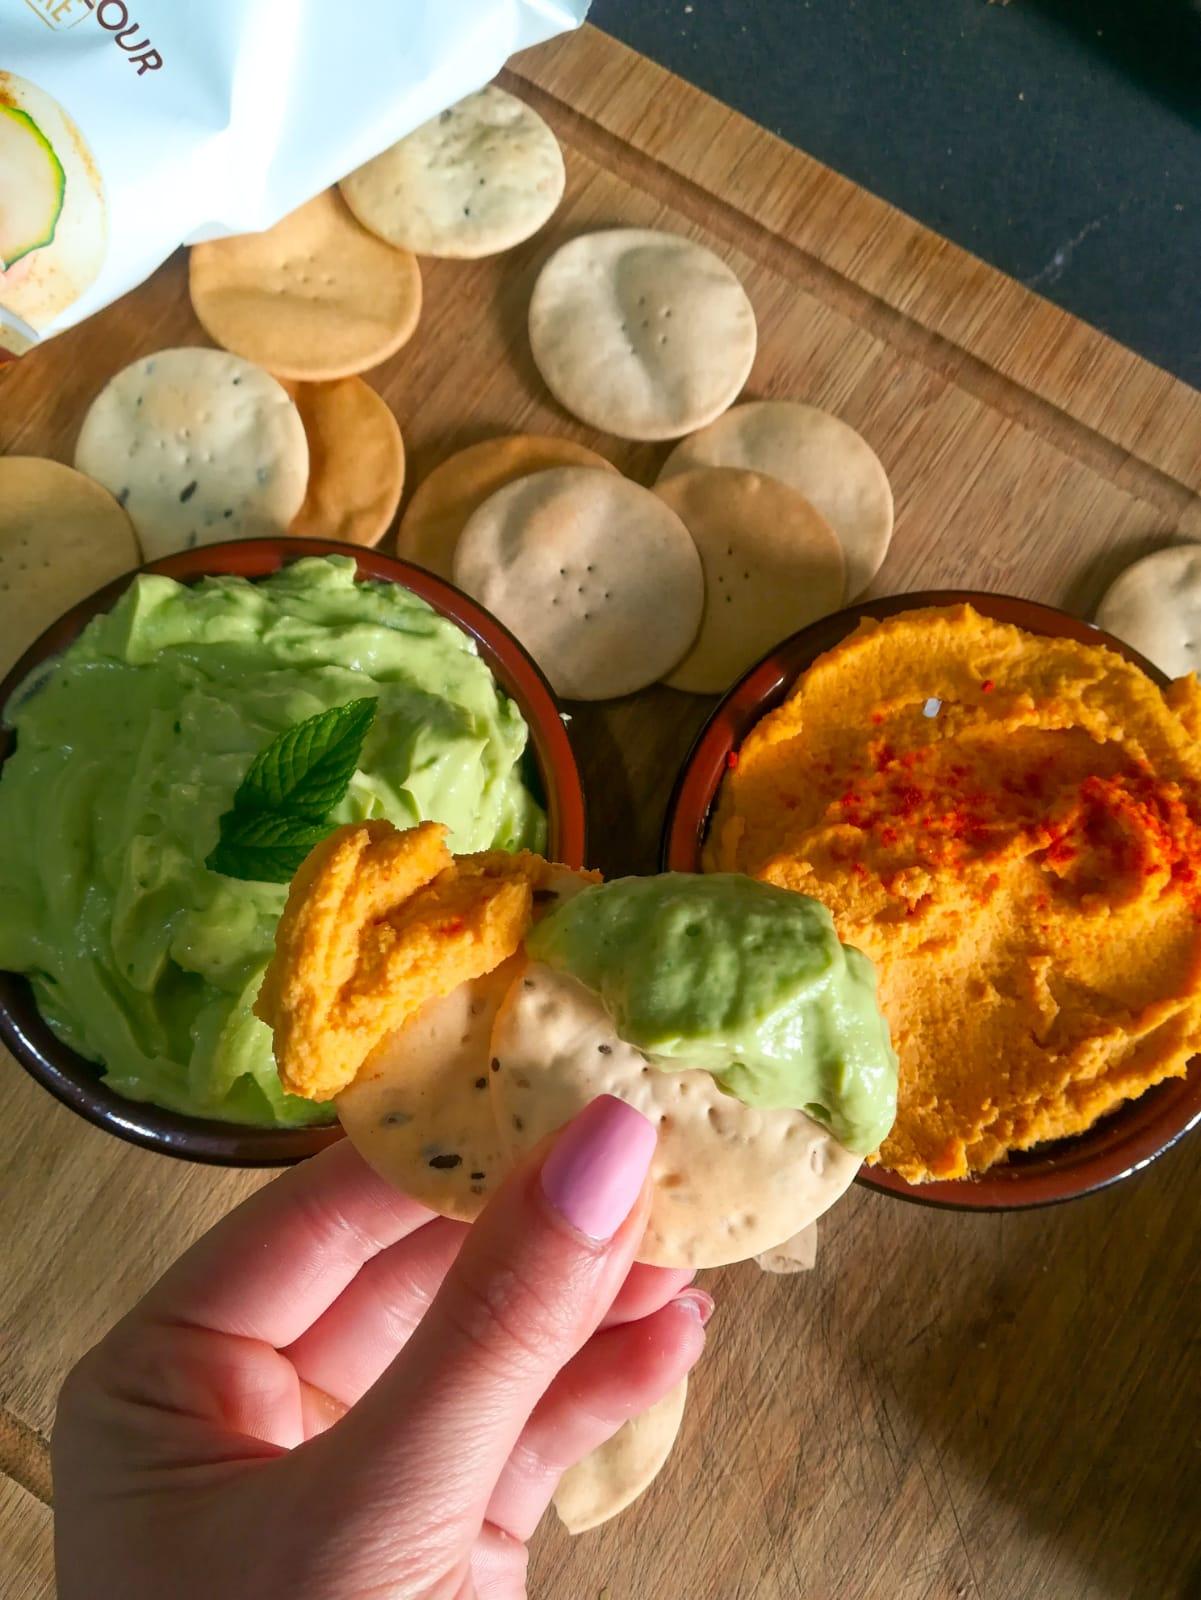 ramona-debono-creamy-mint-avocado-dip